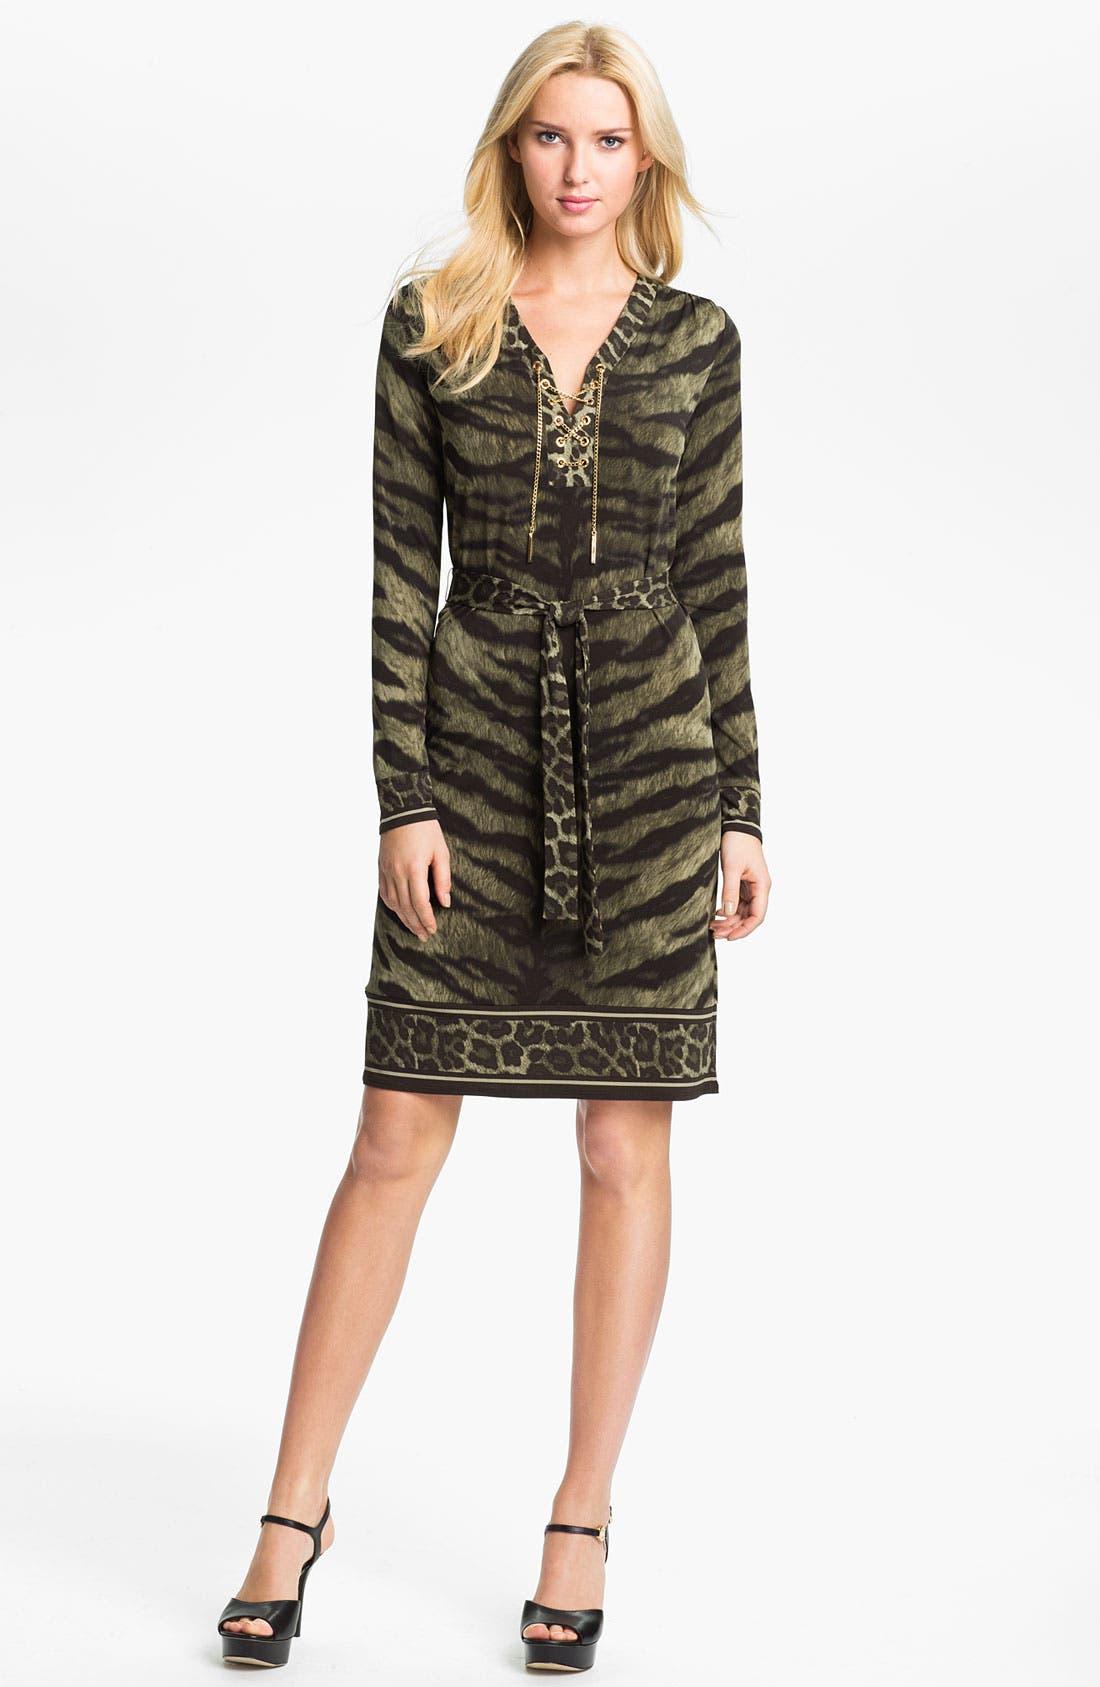 Alternate Image 1 Selected - MICHAEL Michael Kors Print Lace Up Dress